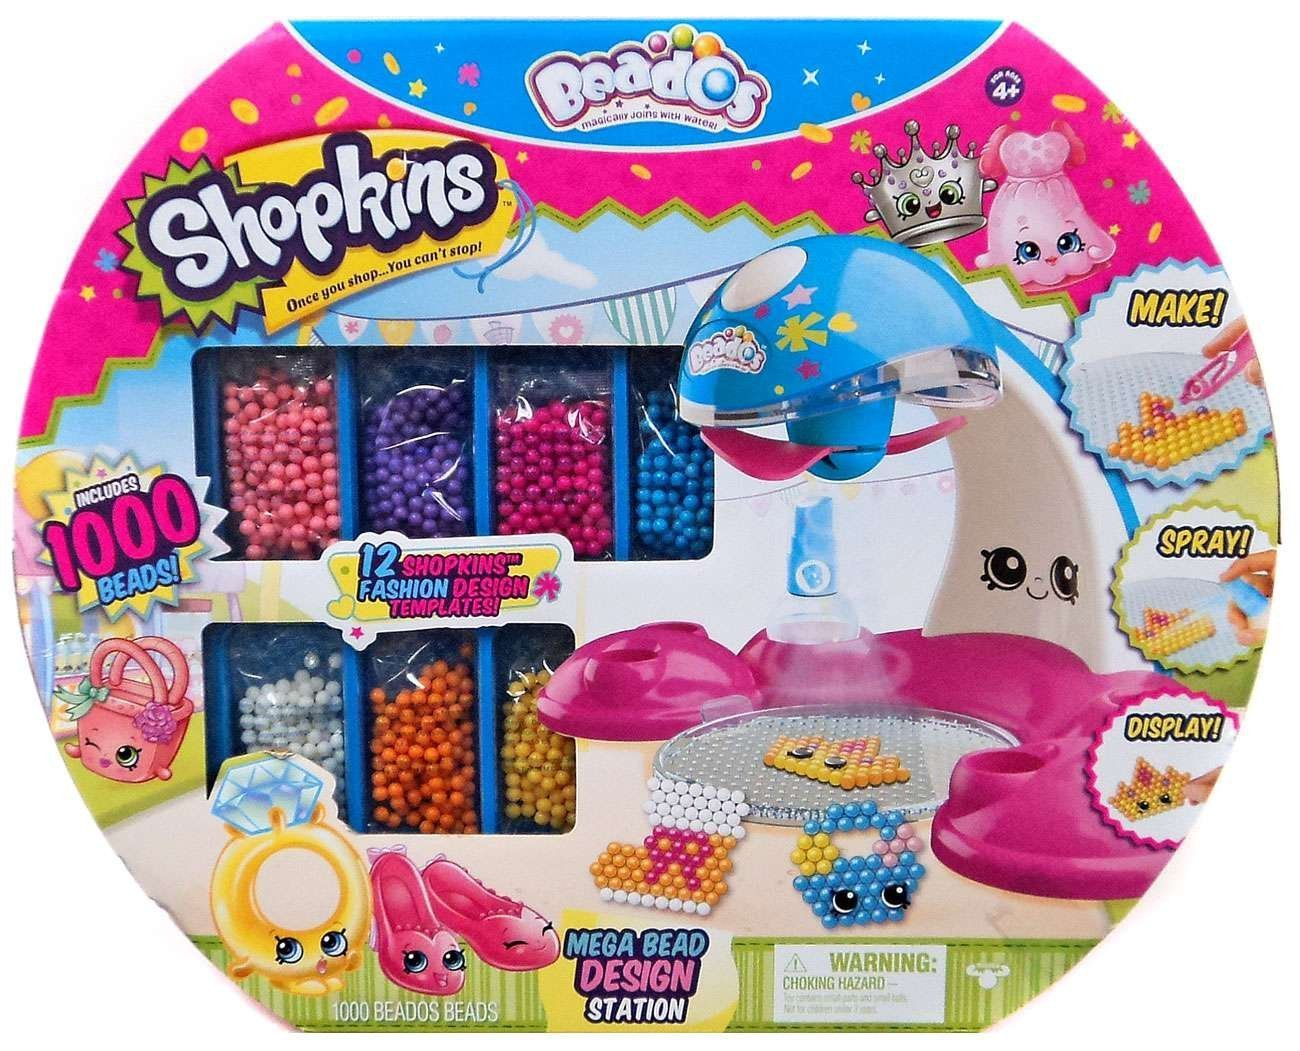 Beados Shopkins Exclusive Mega 1000 Bead Design Station 4336811880